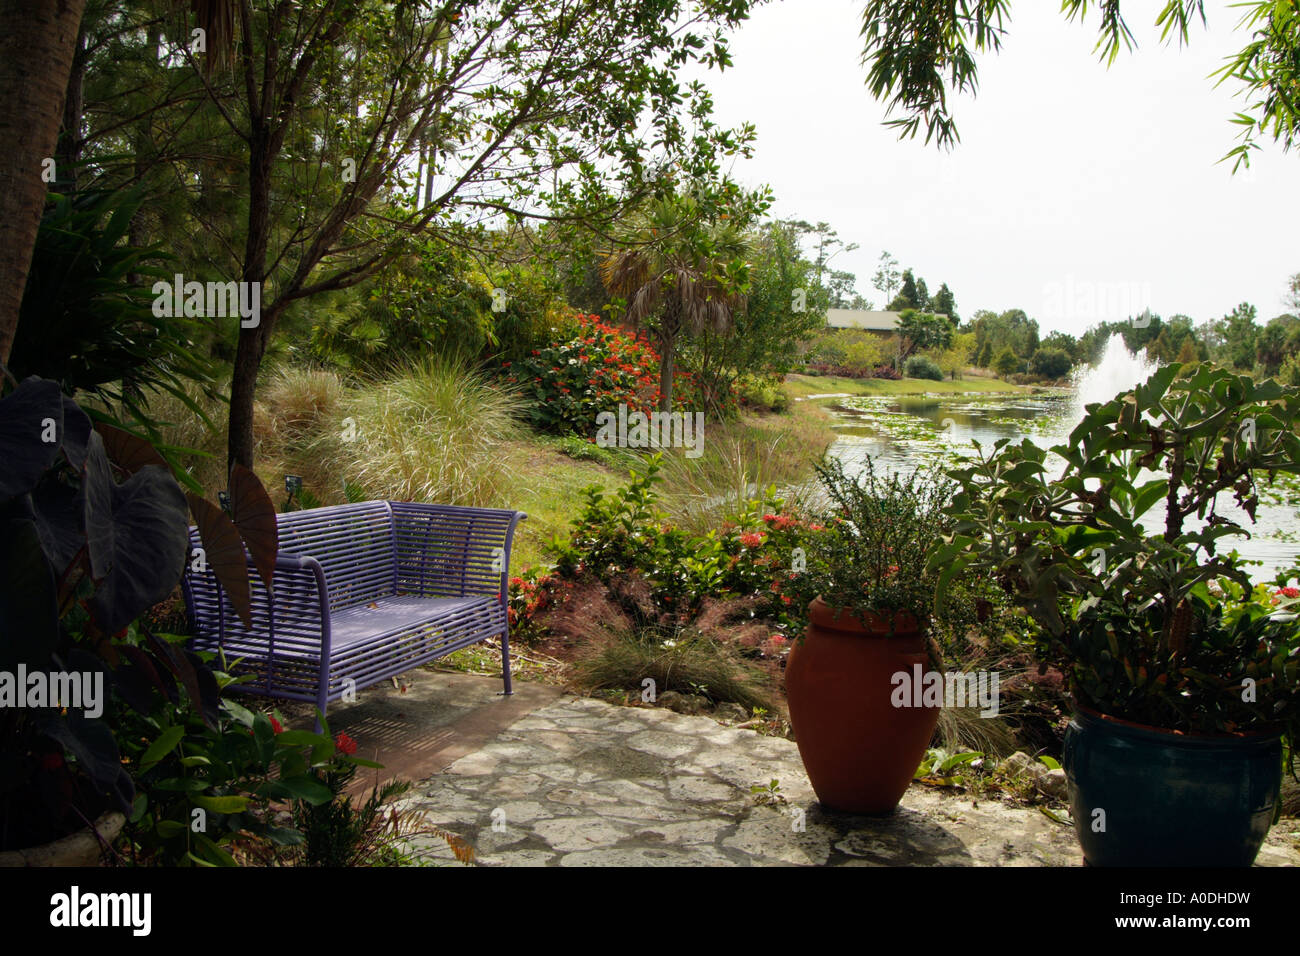 the florida botanical gardens at largo florida usa the botanical